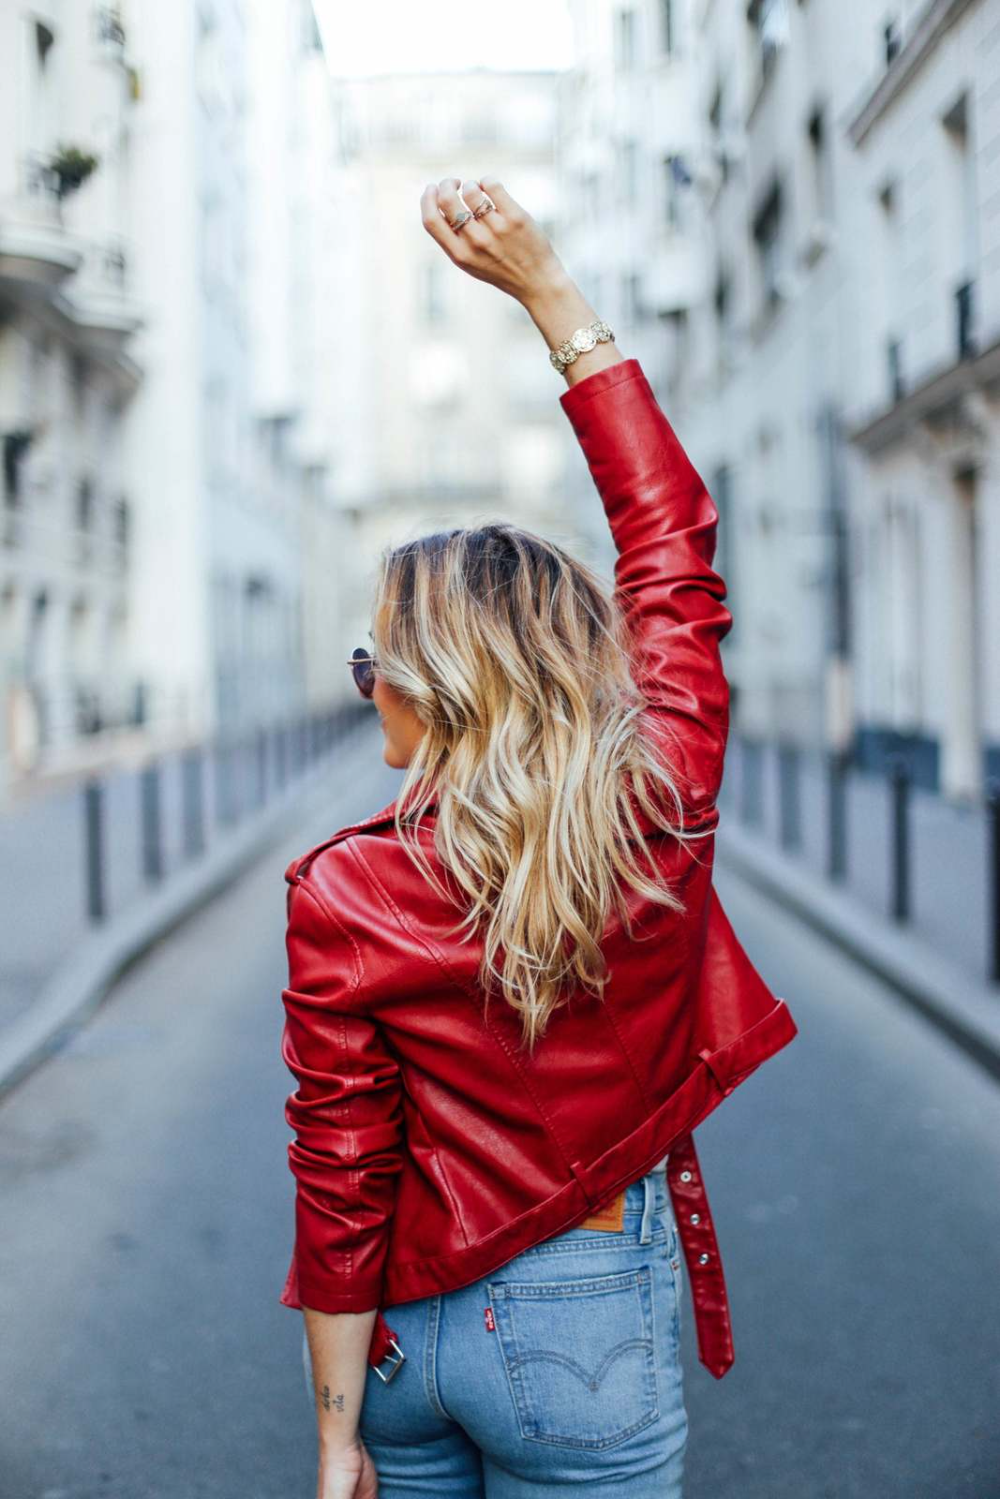 Designer Genuine Leather Handmade Woman Red Moto Women Leather Jacket Coats Jackets Vests In 2021 Leather Jackets Women Leather Jacket Red Jacket Outfit [ 1499 x 1000 Pixel ]